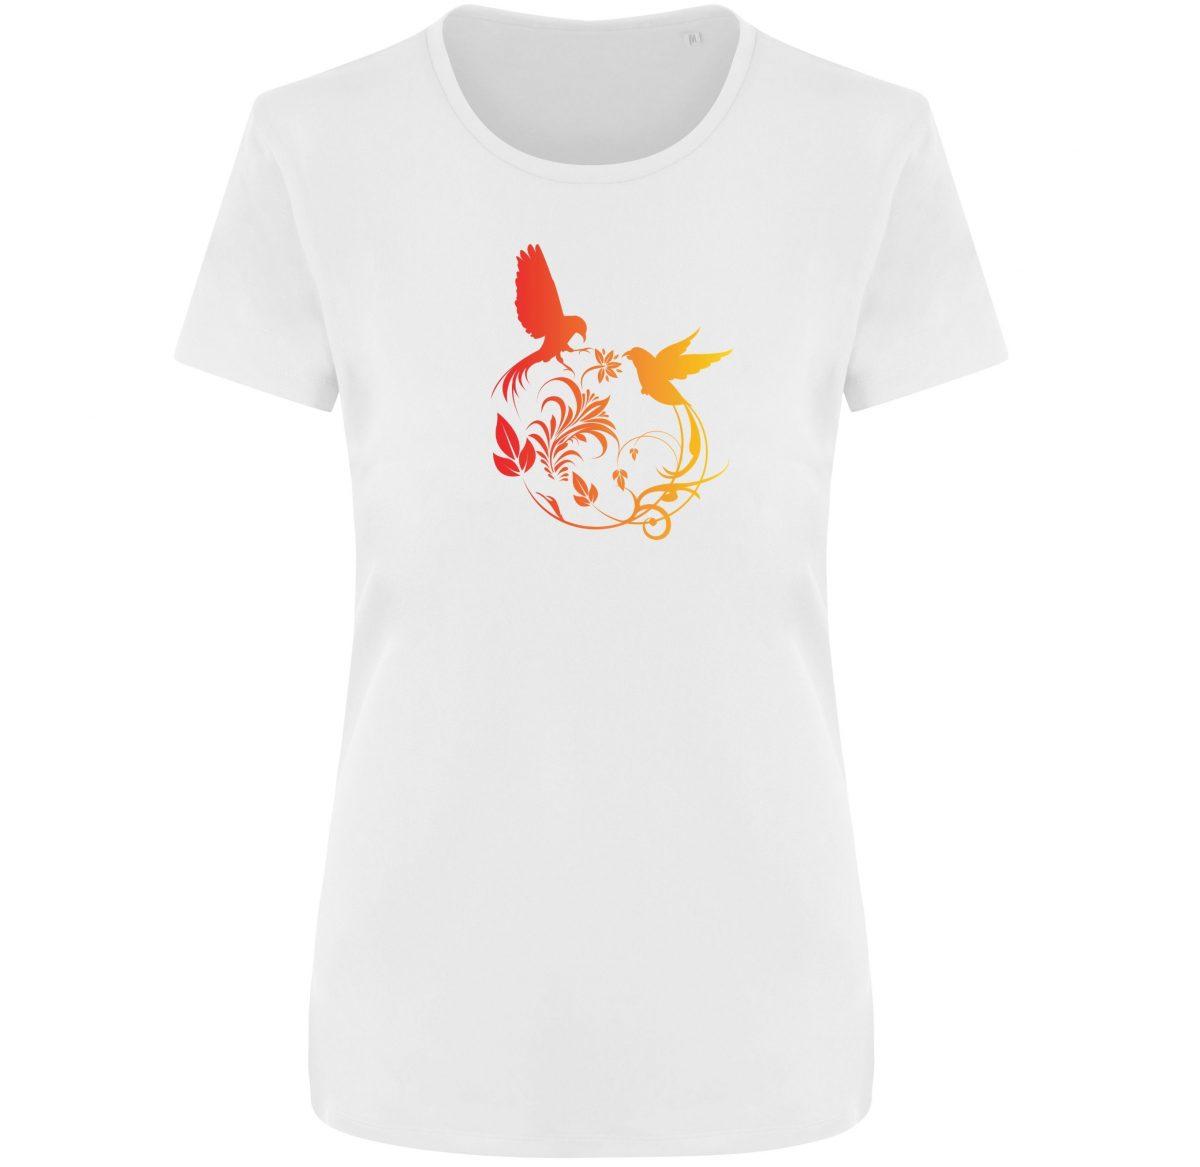 Tee-Shirt Femme Performance – Envolée Amoureuse